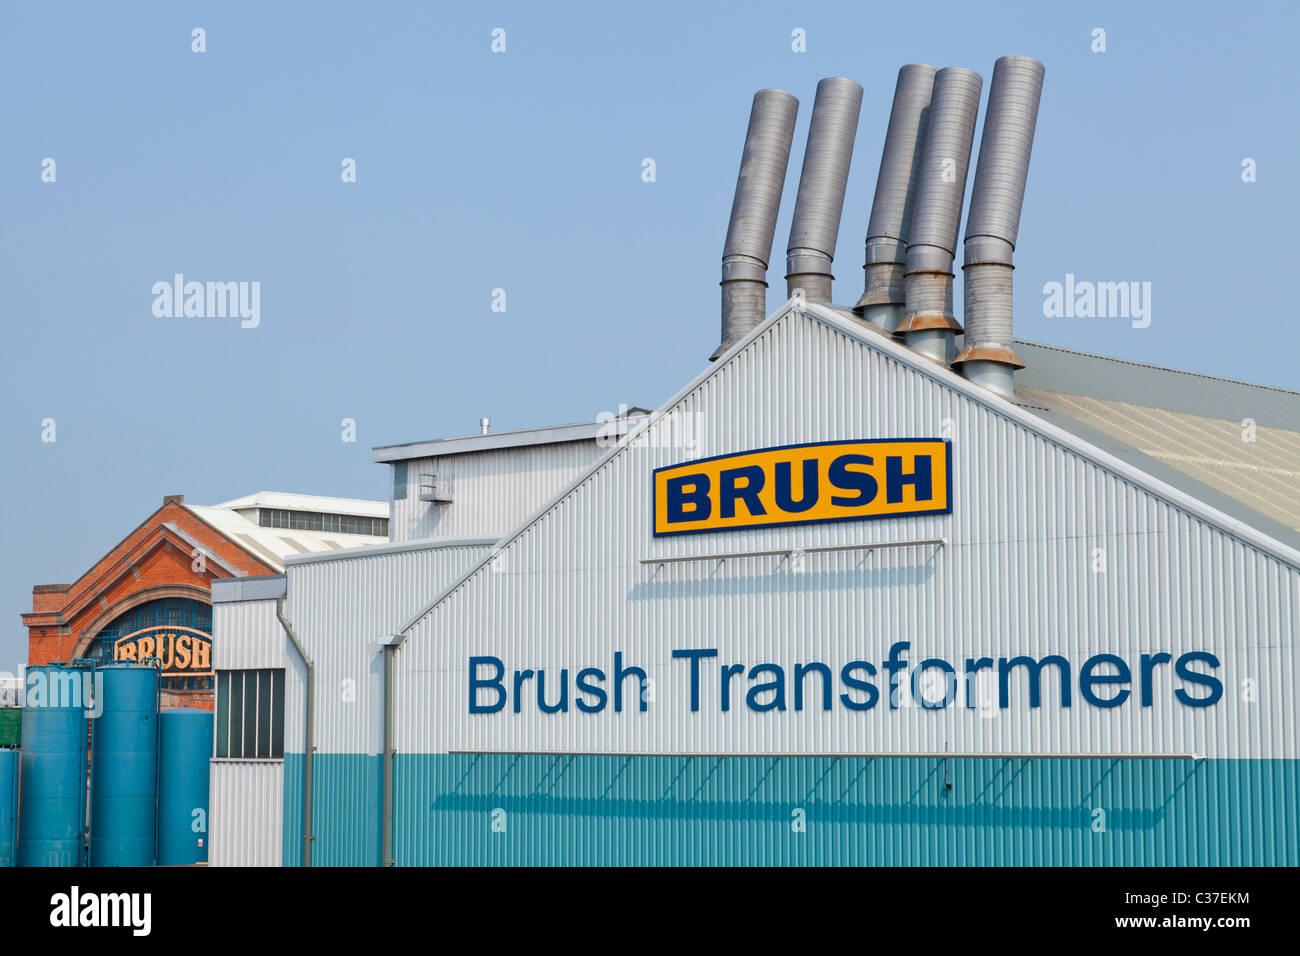 Brush Transformers company Loughborough Leicestershire England GB UK EU Europe - Stock Image